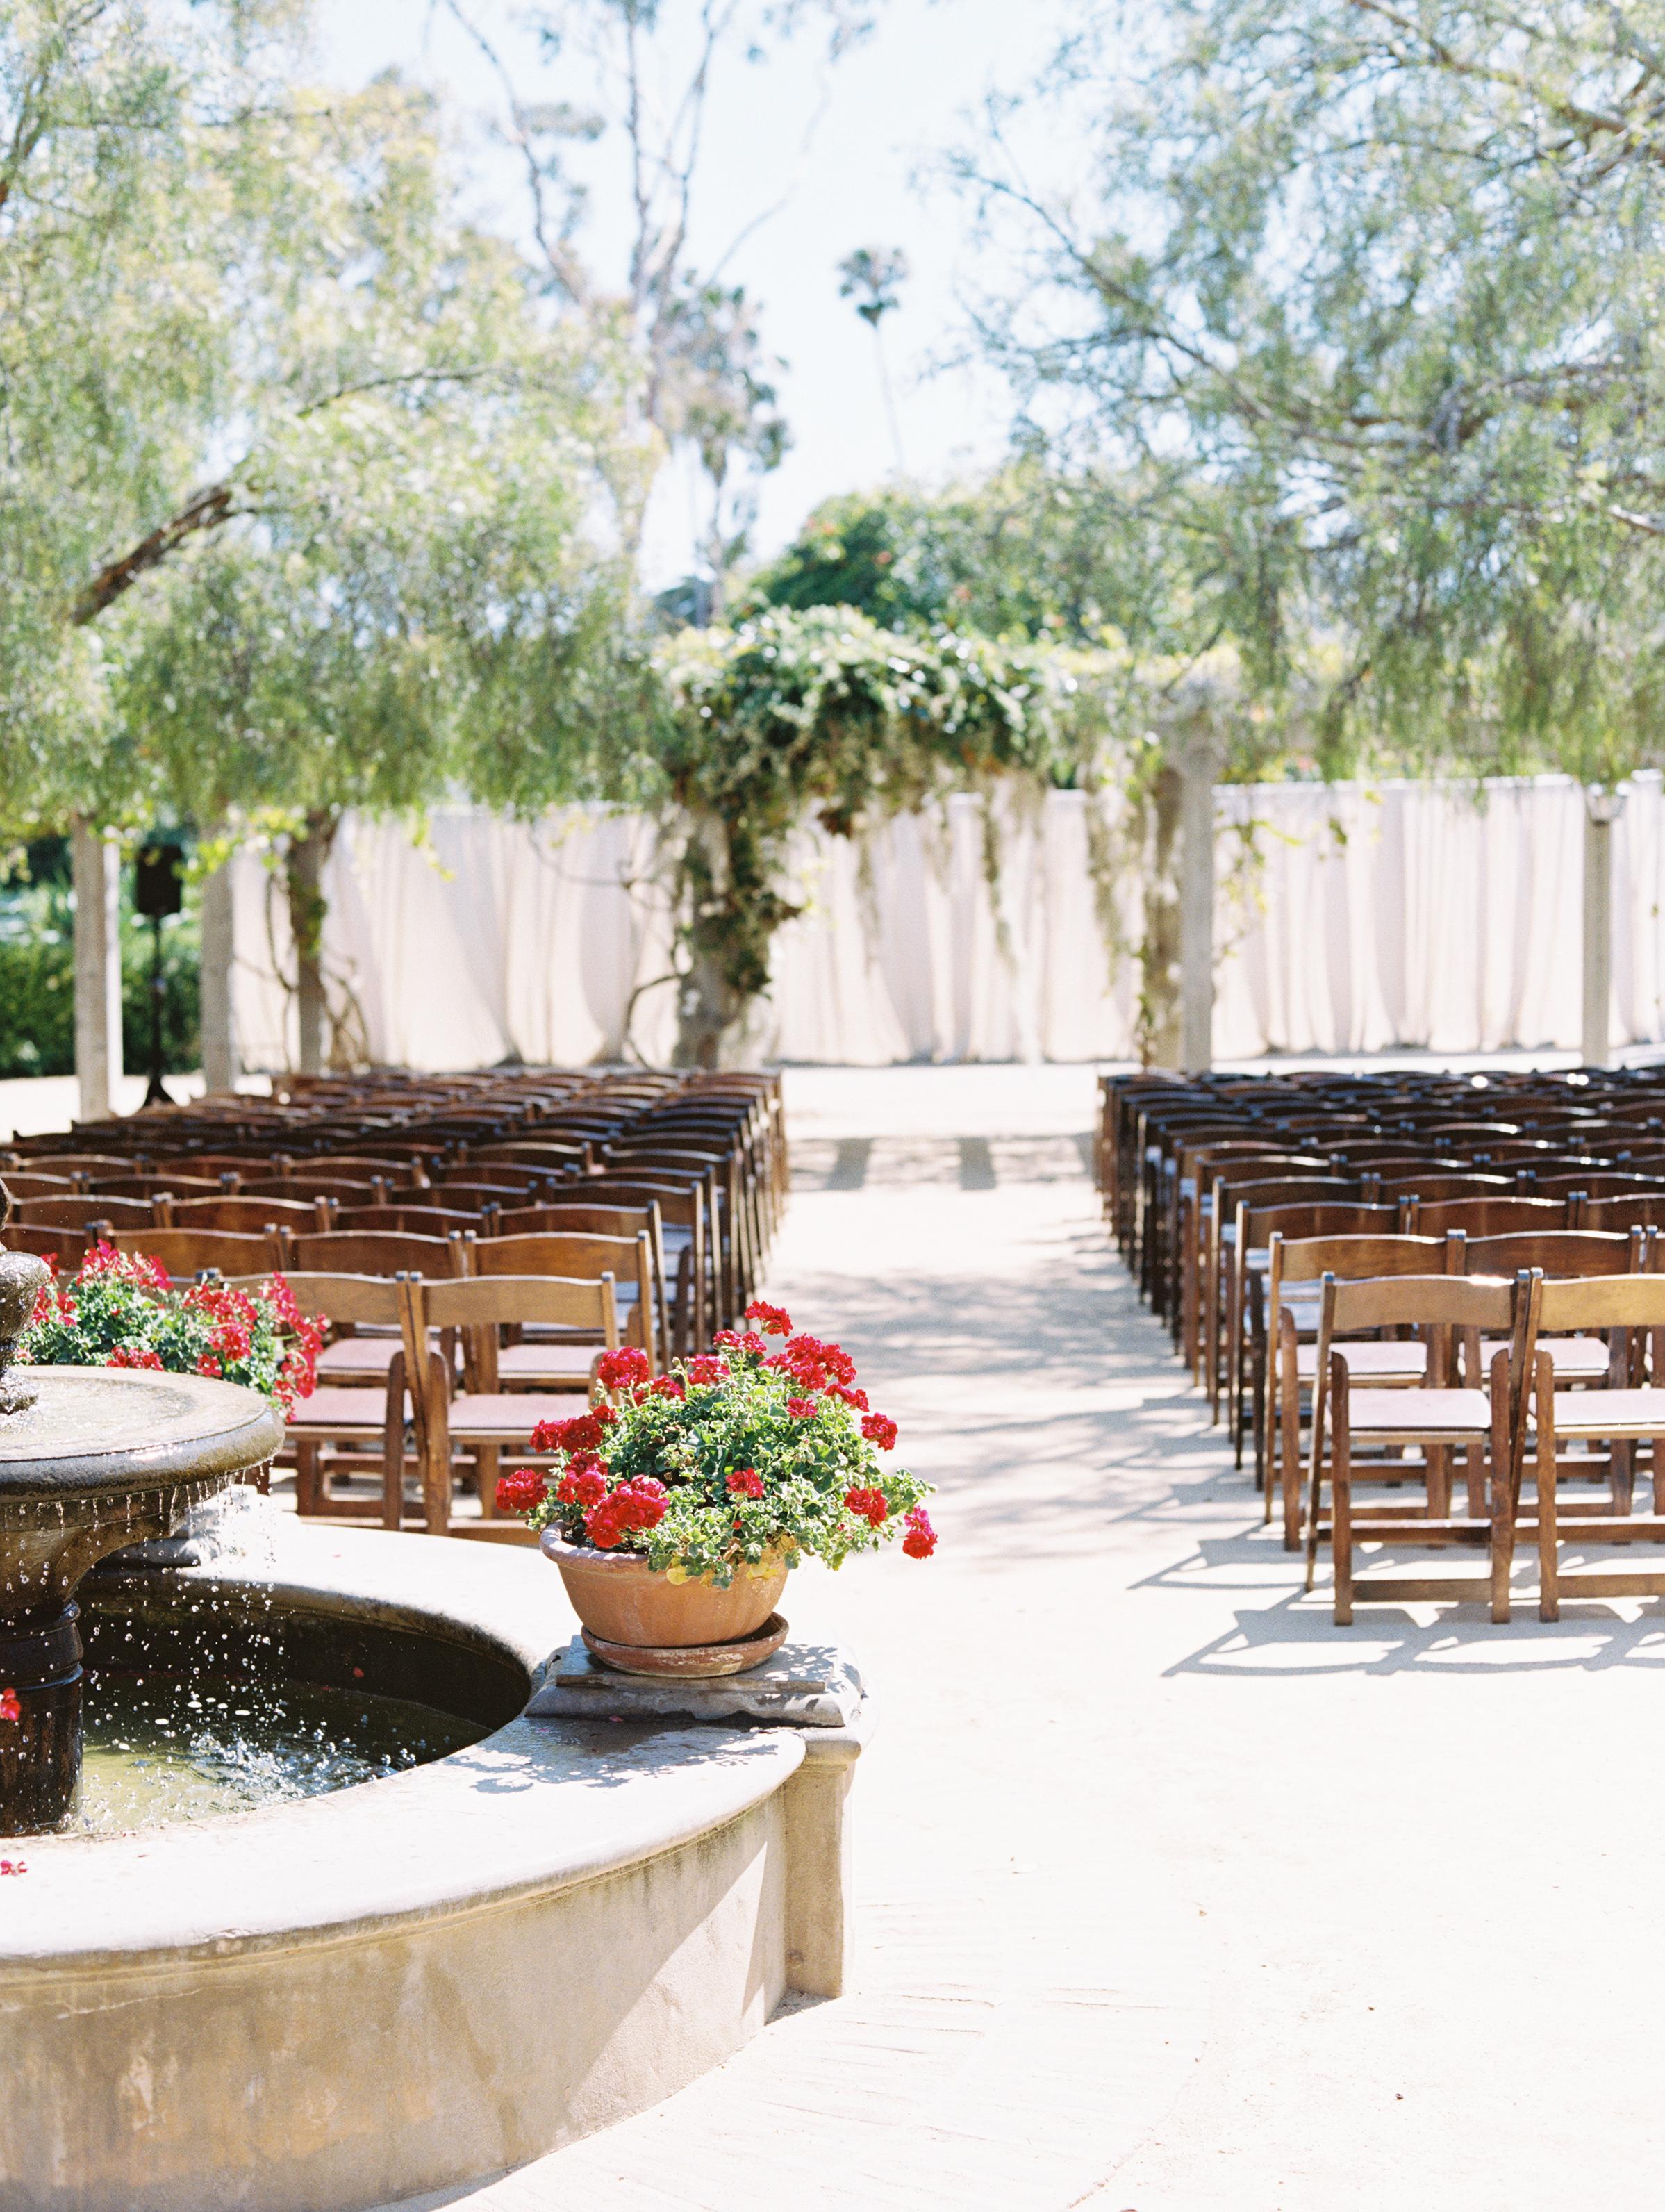 www.santabarbarawedding.com | Pat Moyer Wedding Photography & Films | Santa Barbara Historical Museum | Magnolia Weddings | Camiella Floral Designs | Ceremony